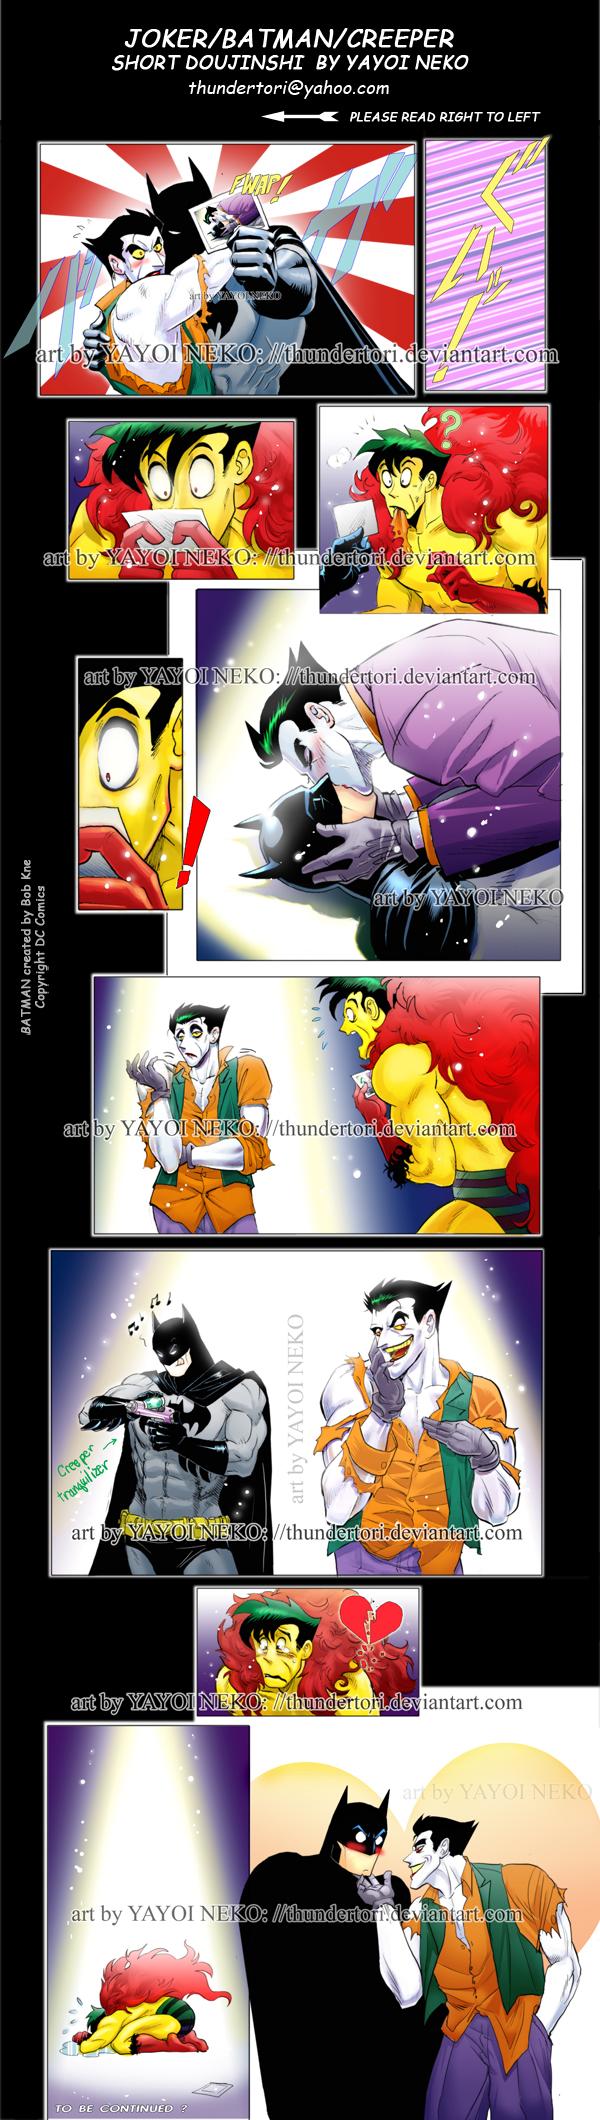 Crrper,Joker,Batman triangle by Thundertori